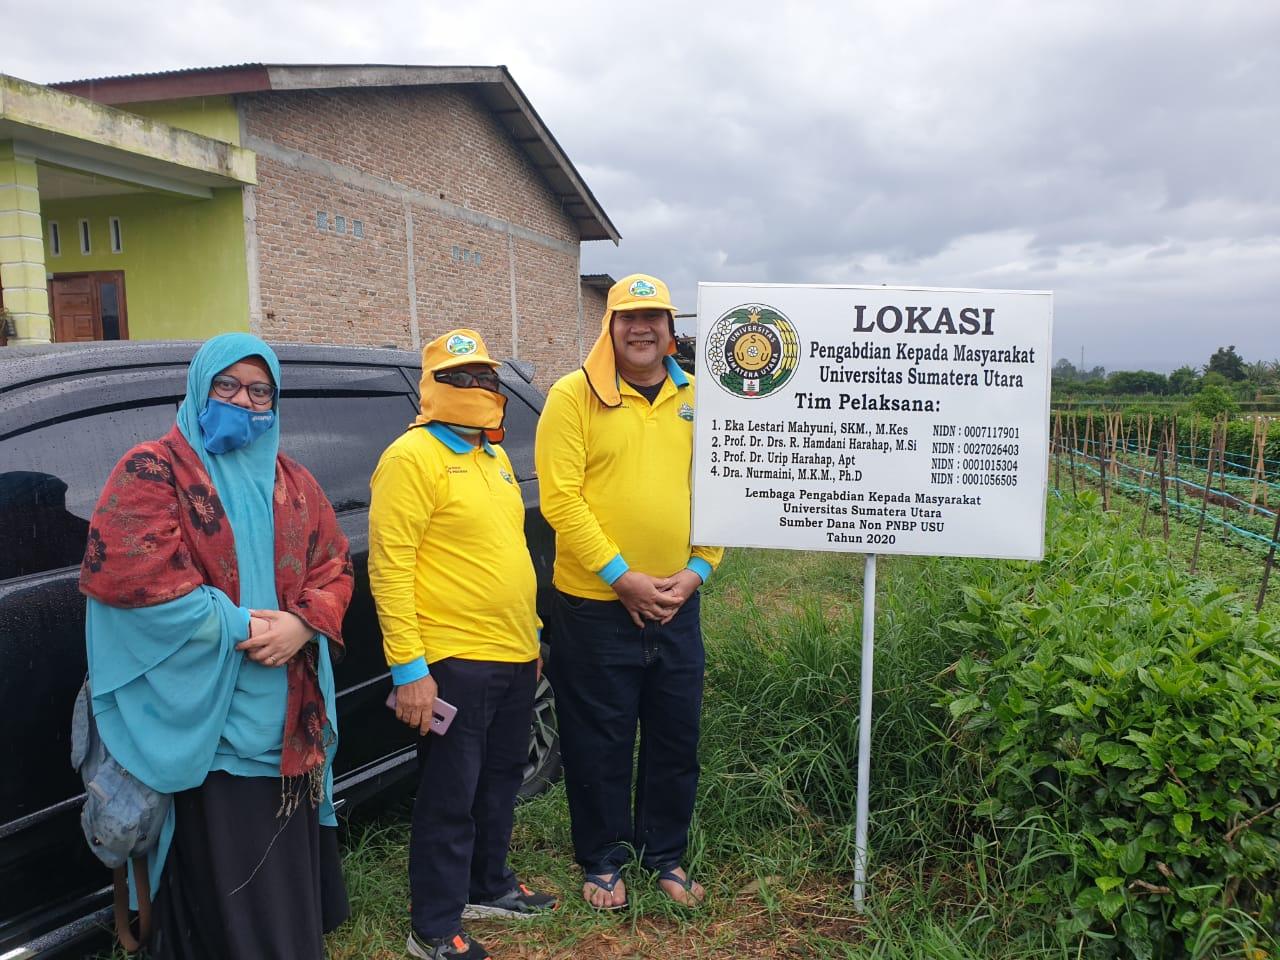 PKM - USU, Camat Kabanjahe Apresiasi Aksi Gempar Untuk Petani Karo di Desa Sumbul